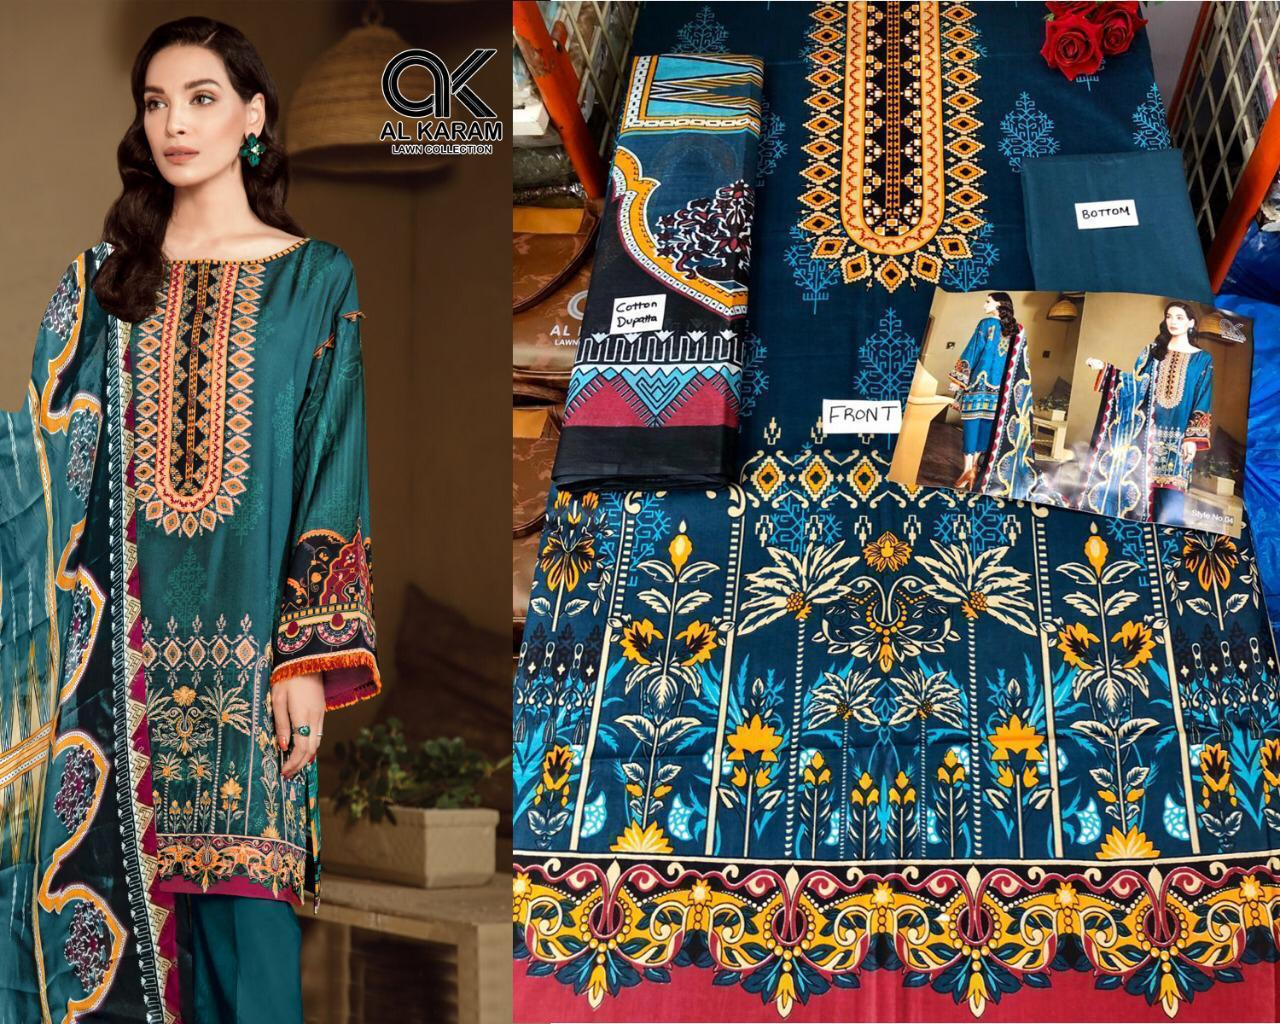 Al Akram Vol 1 Kesariya Cotton Magic Print With Mal Mal Dupatta Suits In Lowest Price Wholesale